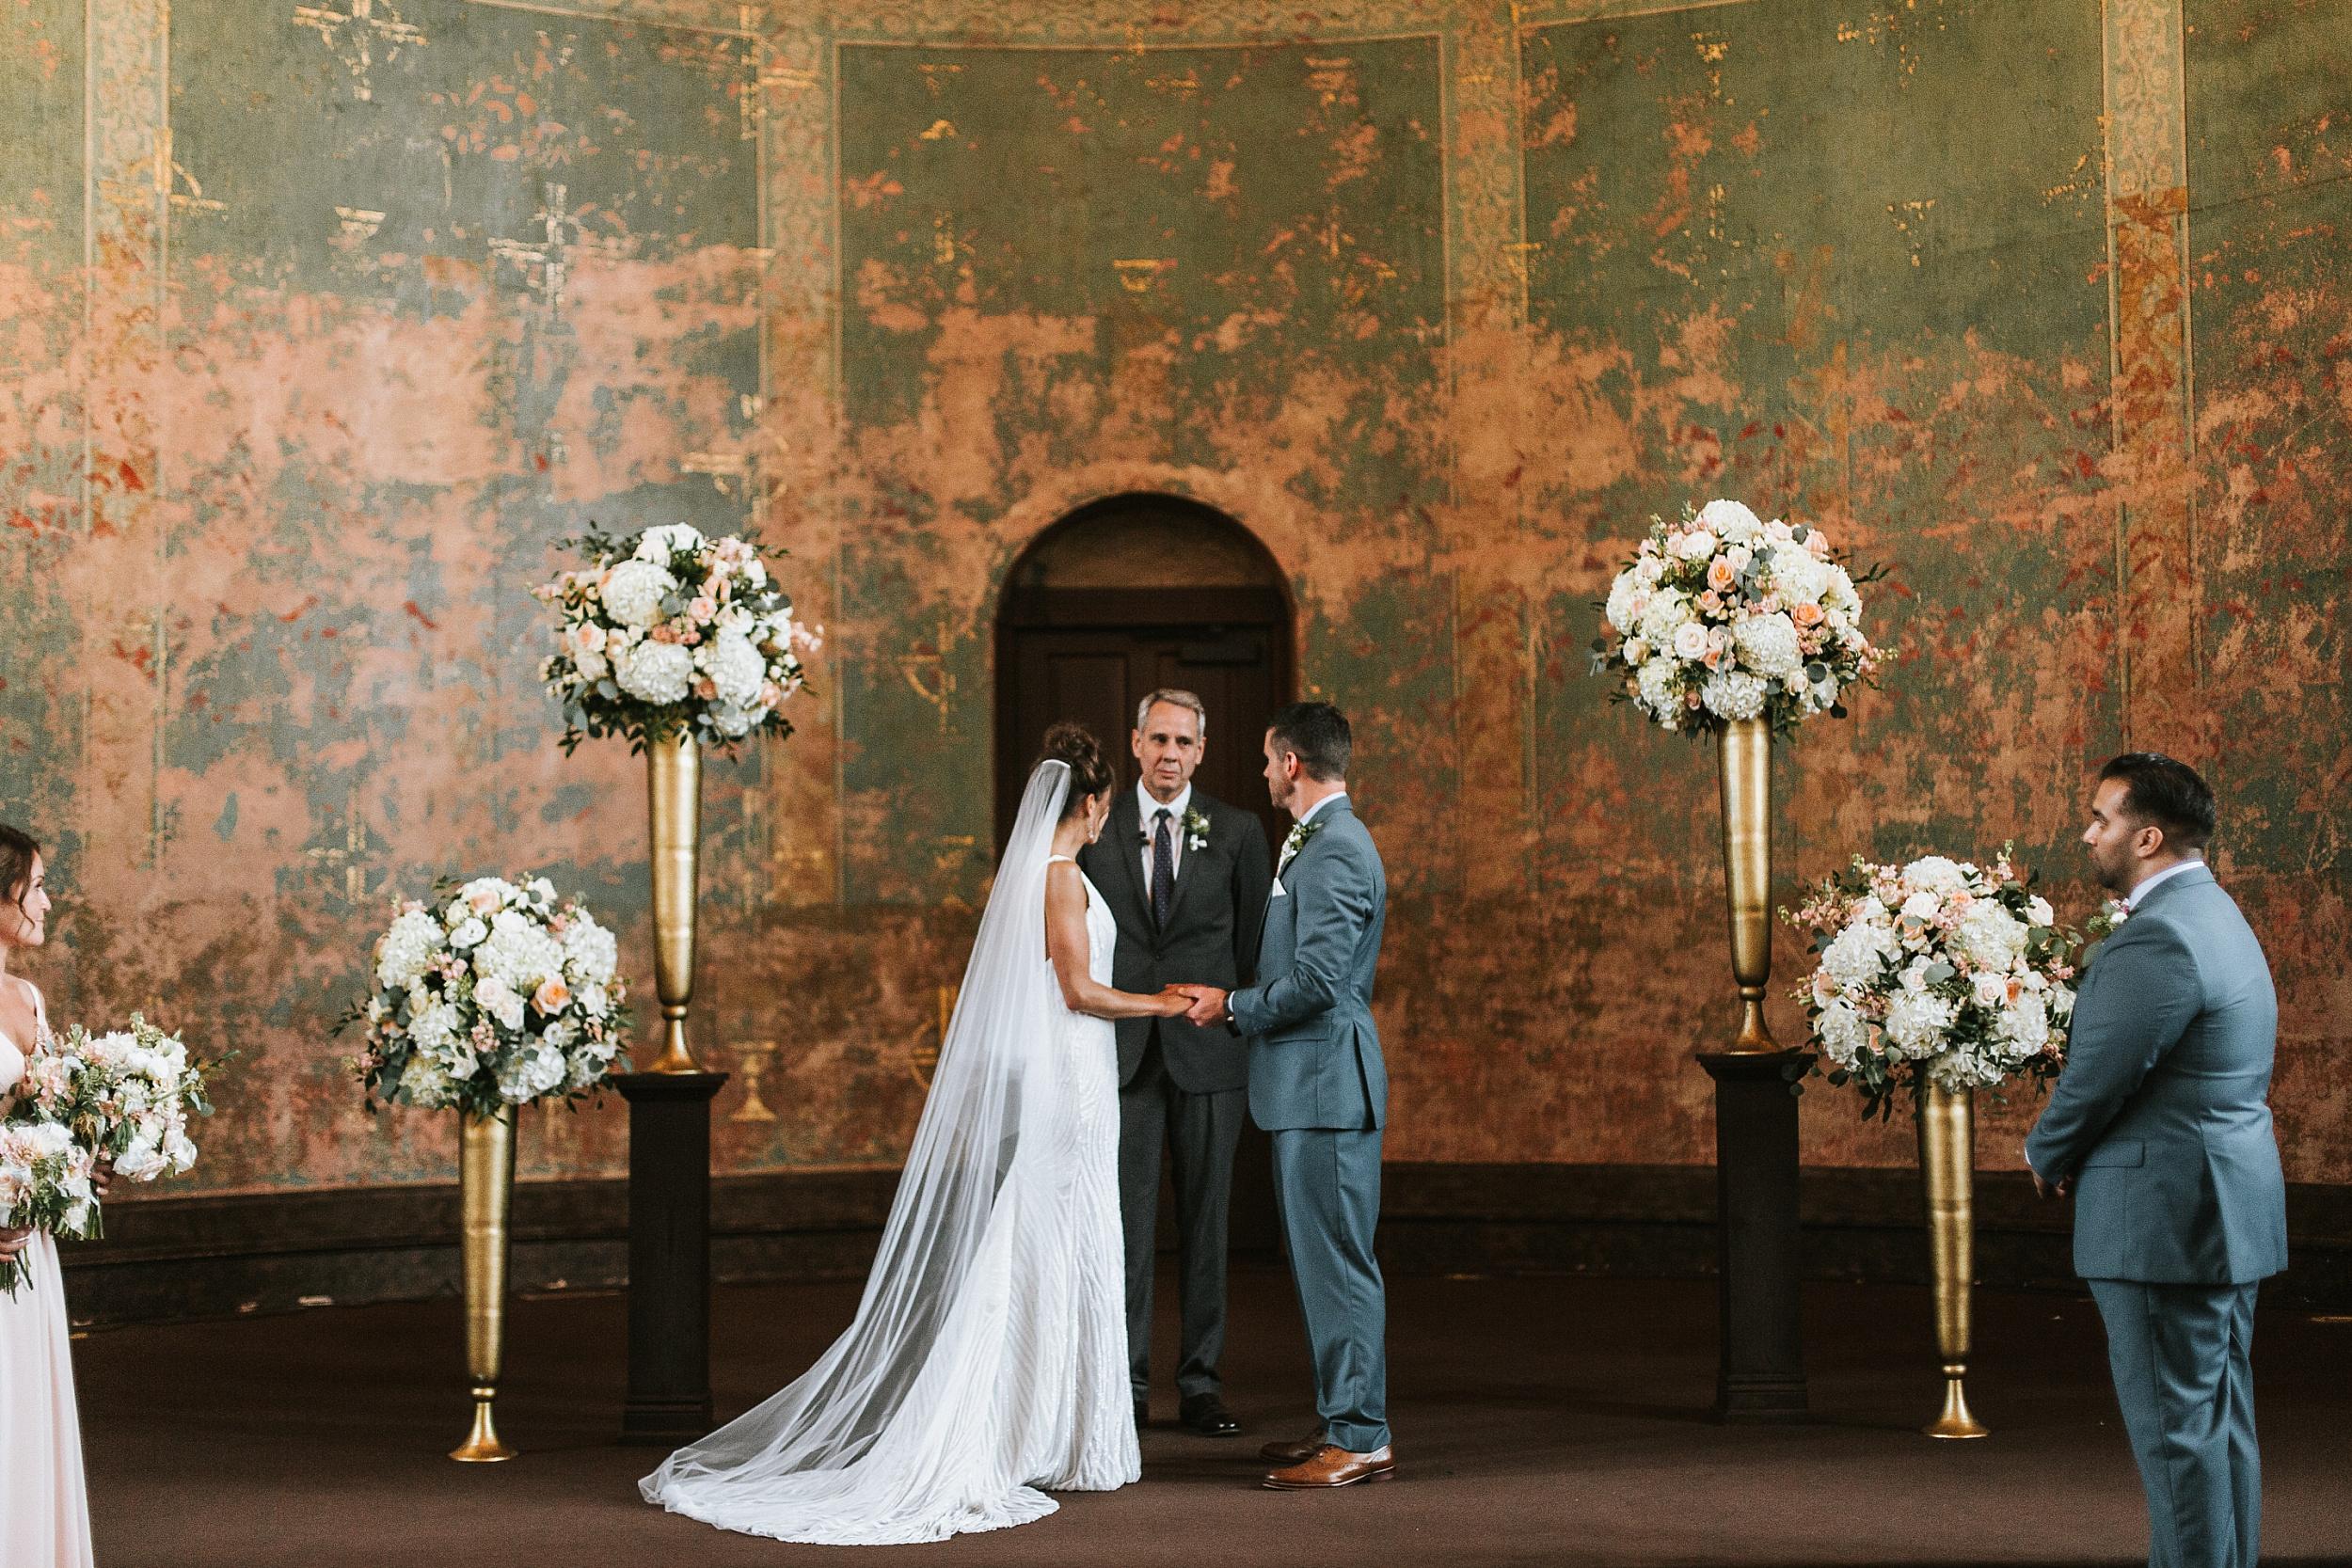 Brooke Townsend Photography - Cincinnati Wedding Photographer (116 of 170).jpg